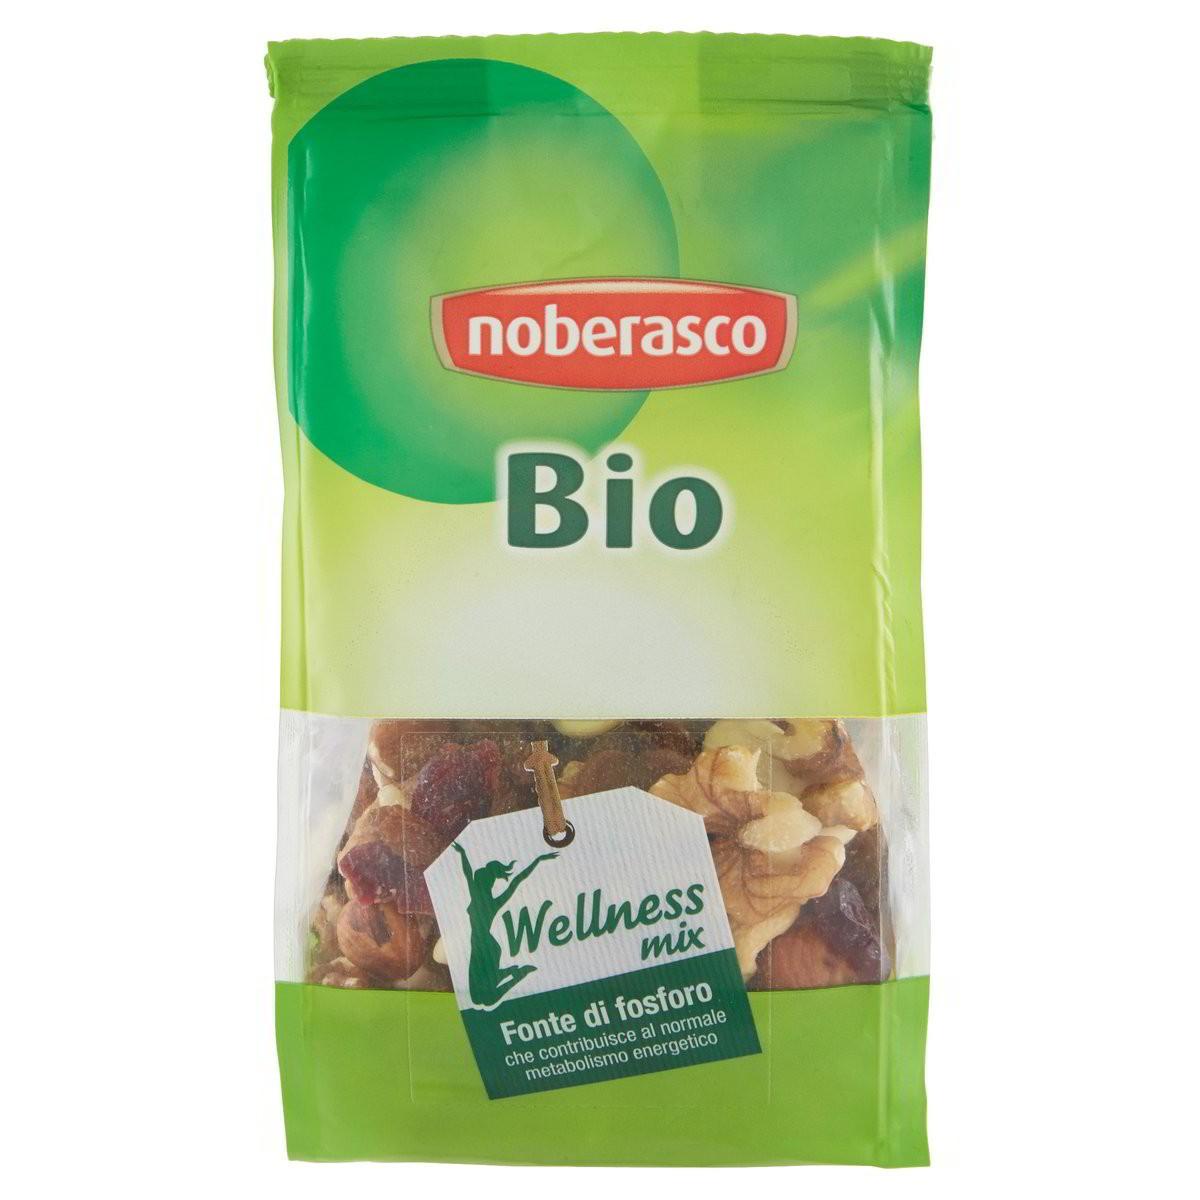 Noberasco Wellness mix bio